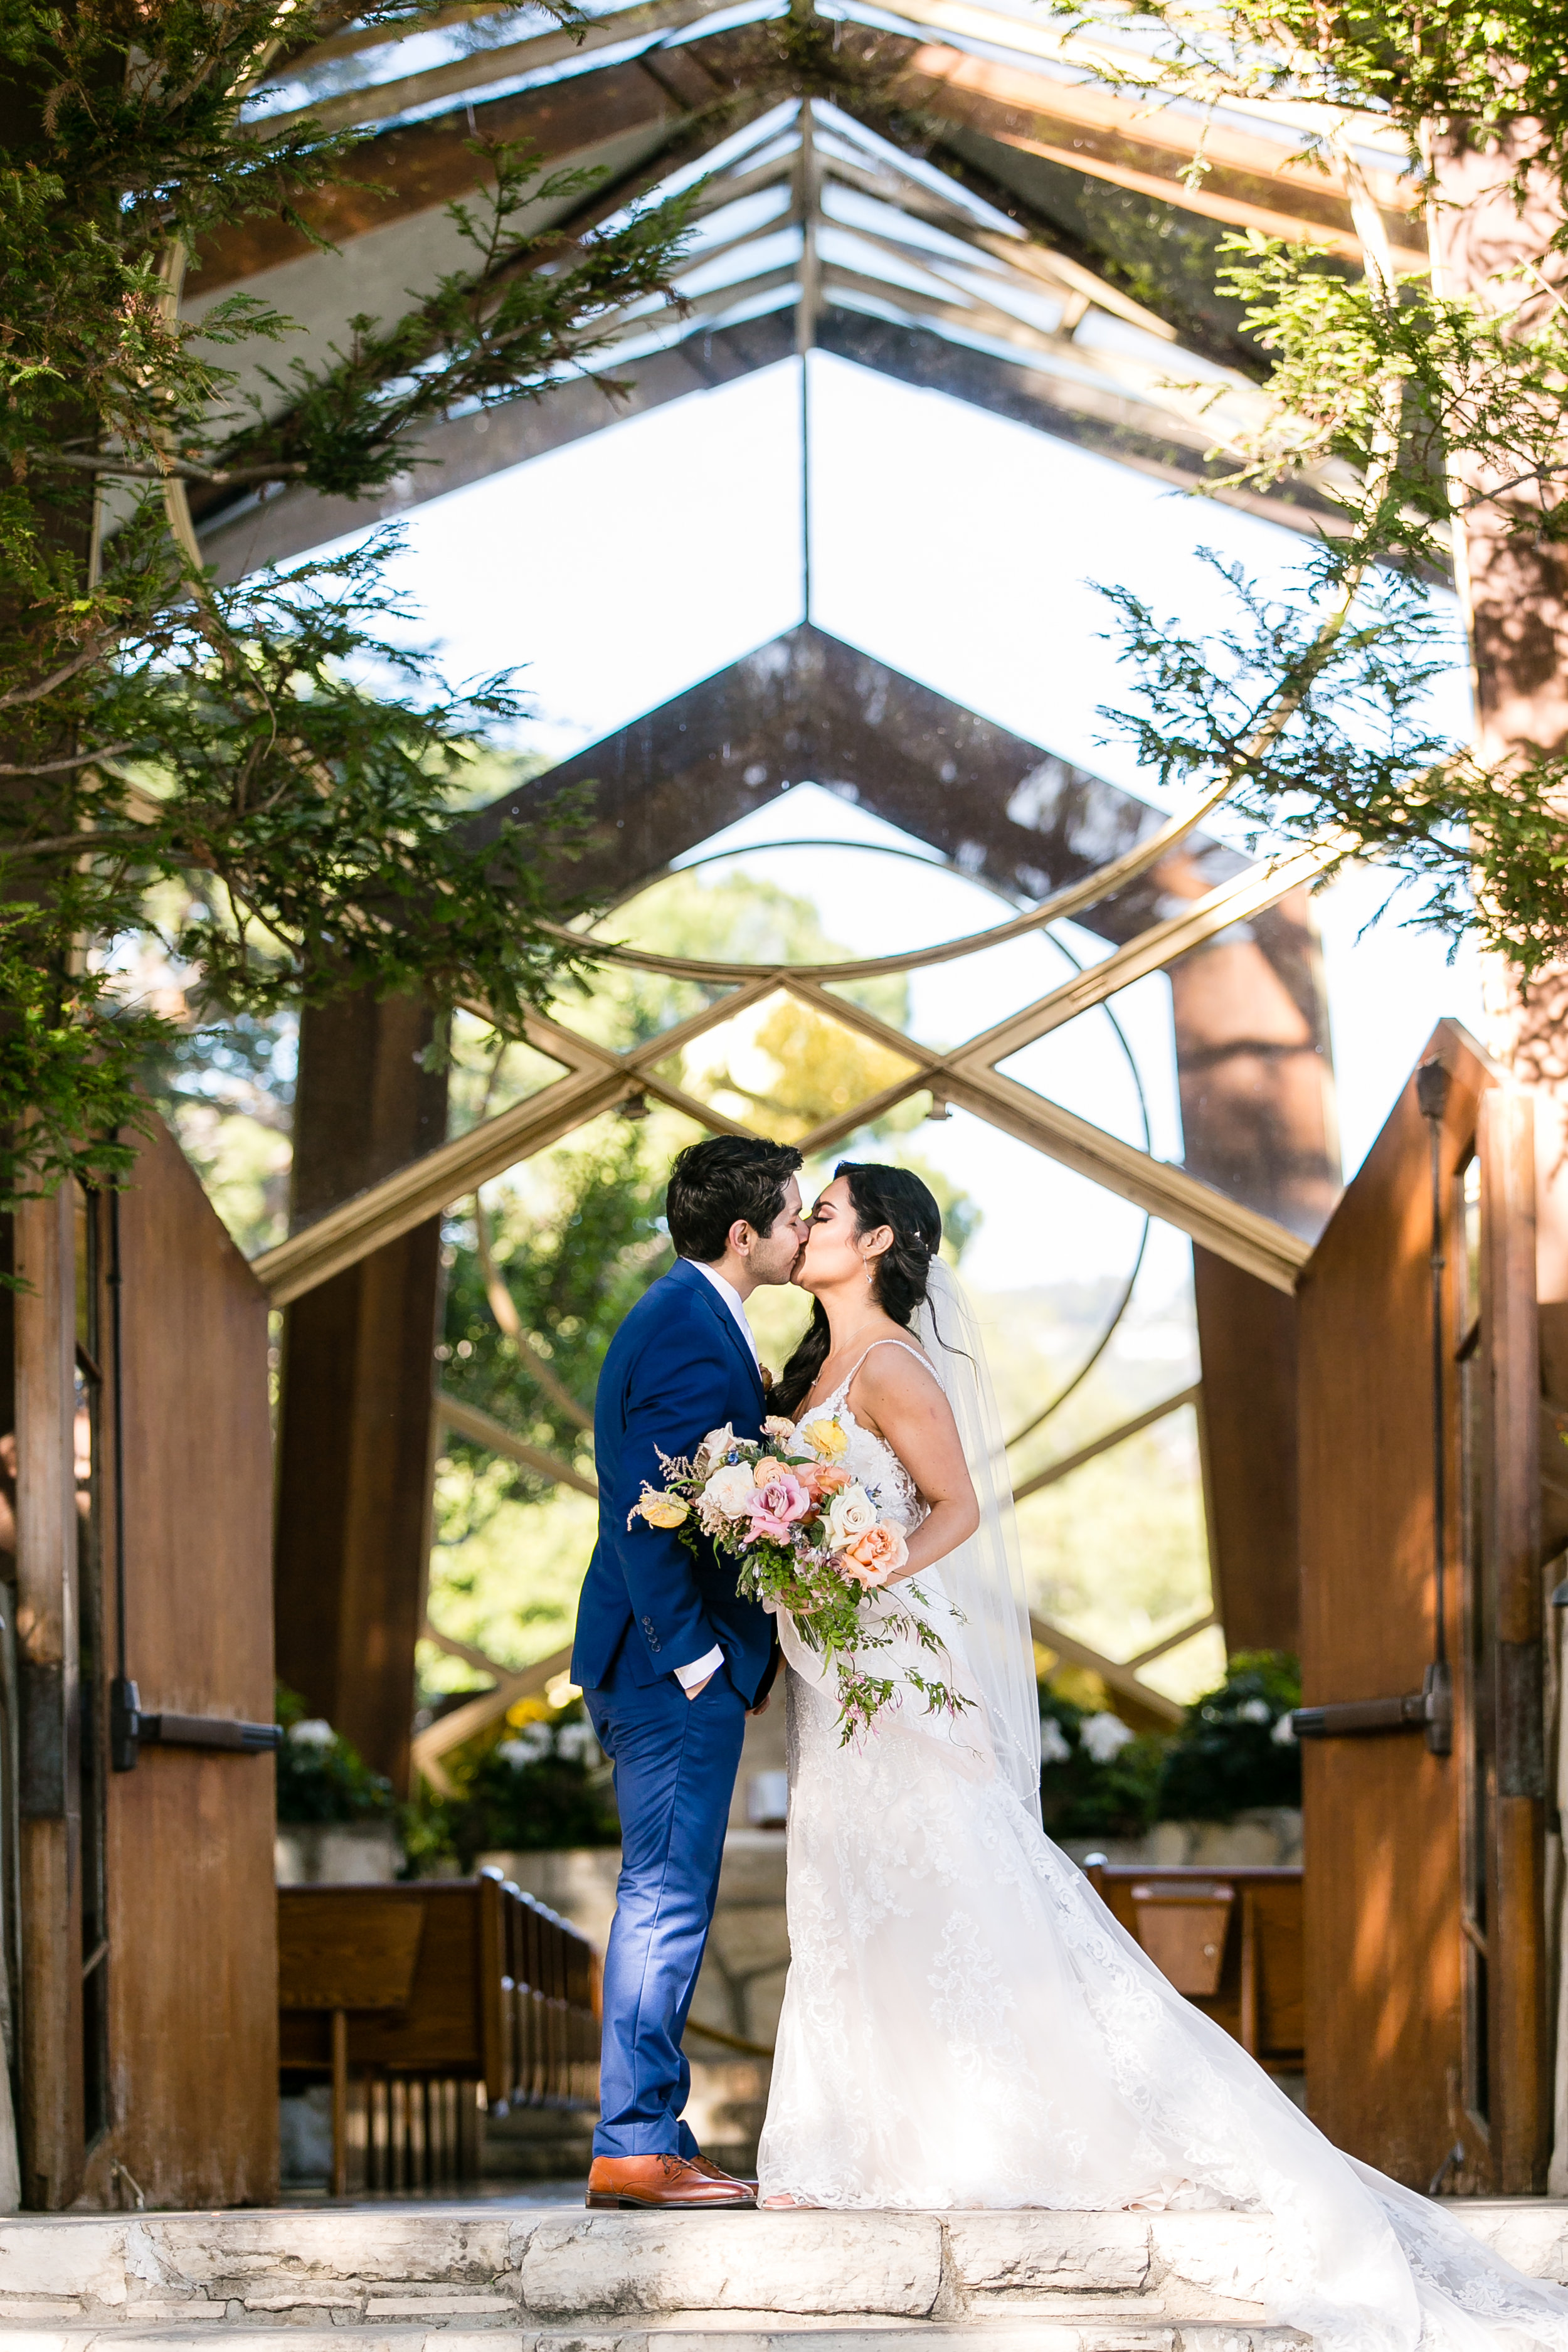 2019_05_24_Wedding_Barajas_0690.jpg